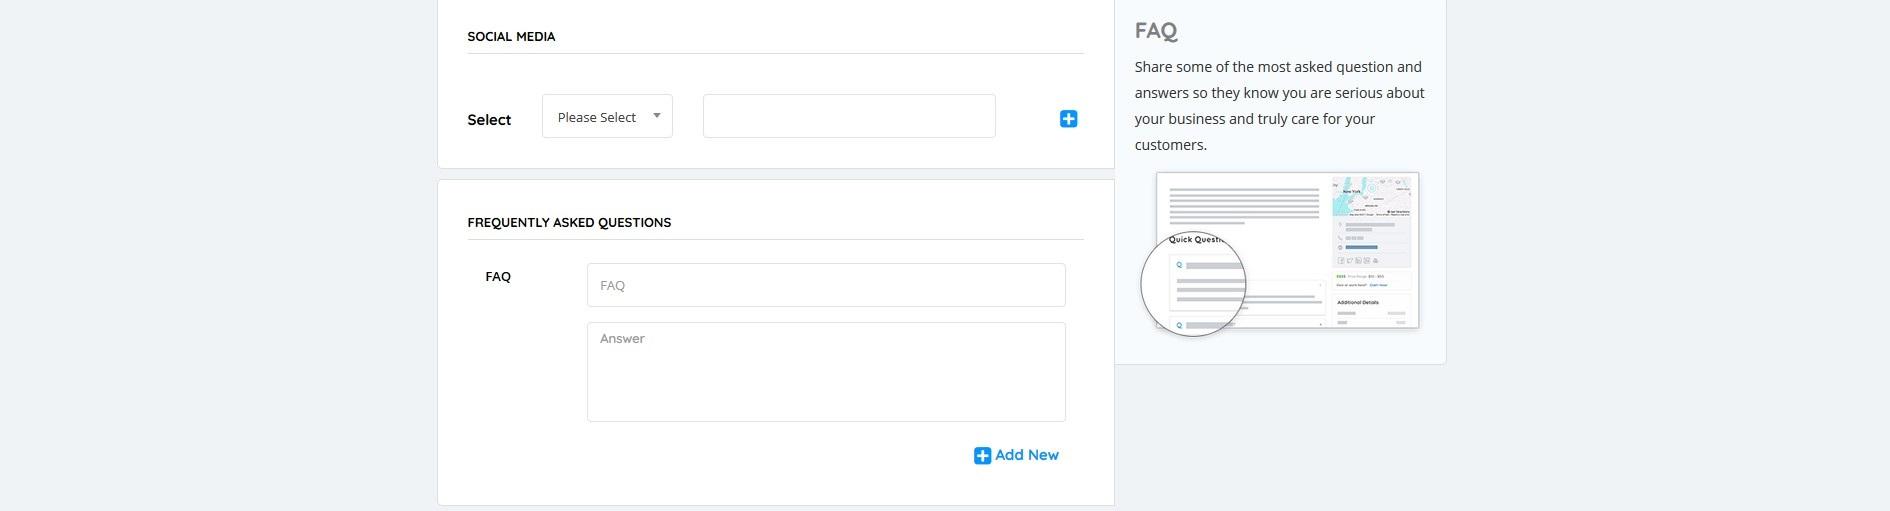 5 Social media and FAQs